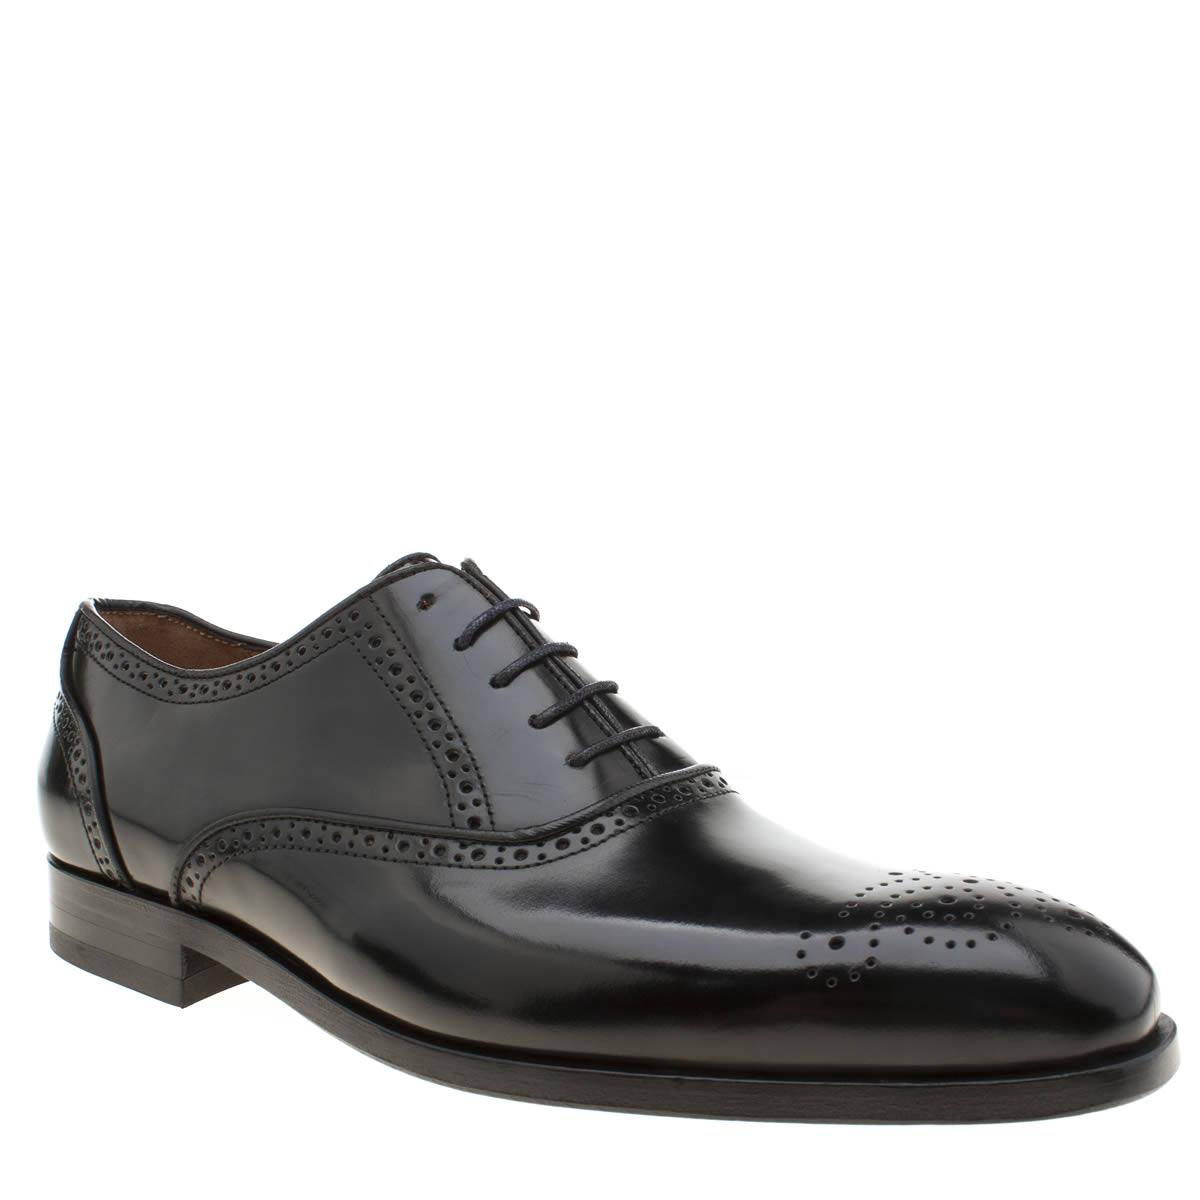 paul smith shoe ps Paul Smith Shoe Ps Black Gilbert Shoes